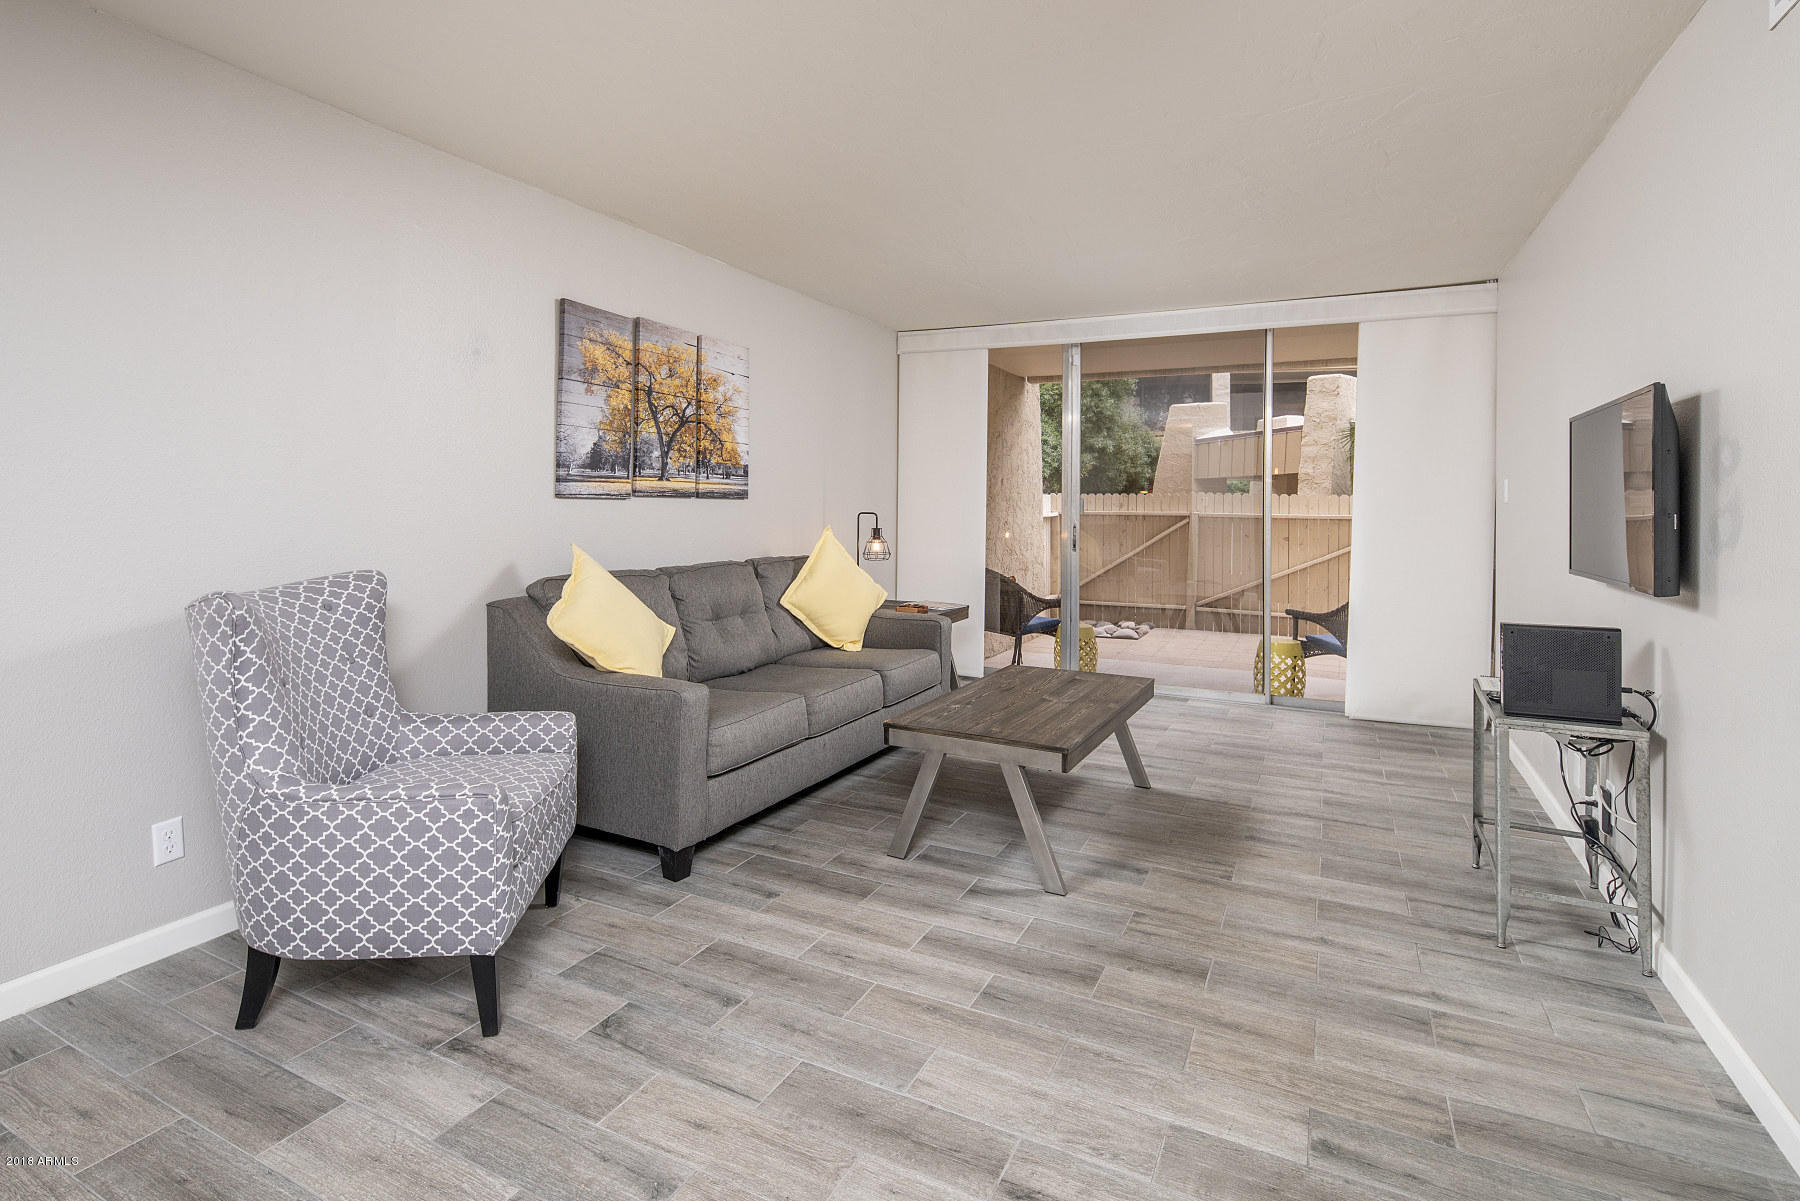 7625 E CAMELBACK Road Unit A114 Scottsdale, AZ 85251 - MLS #: 5852713